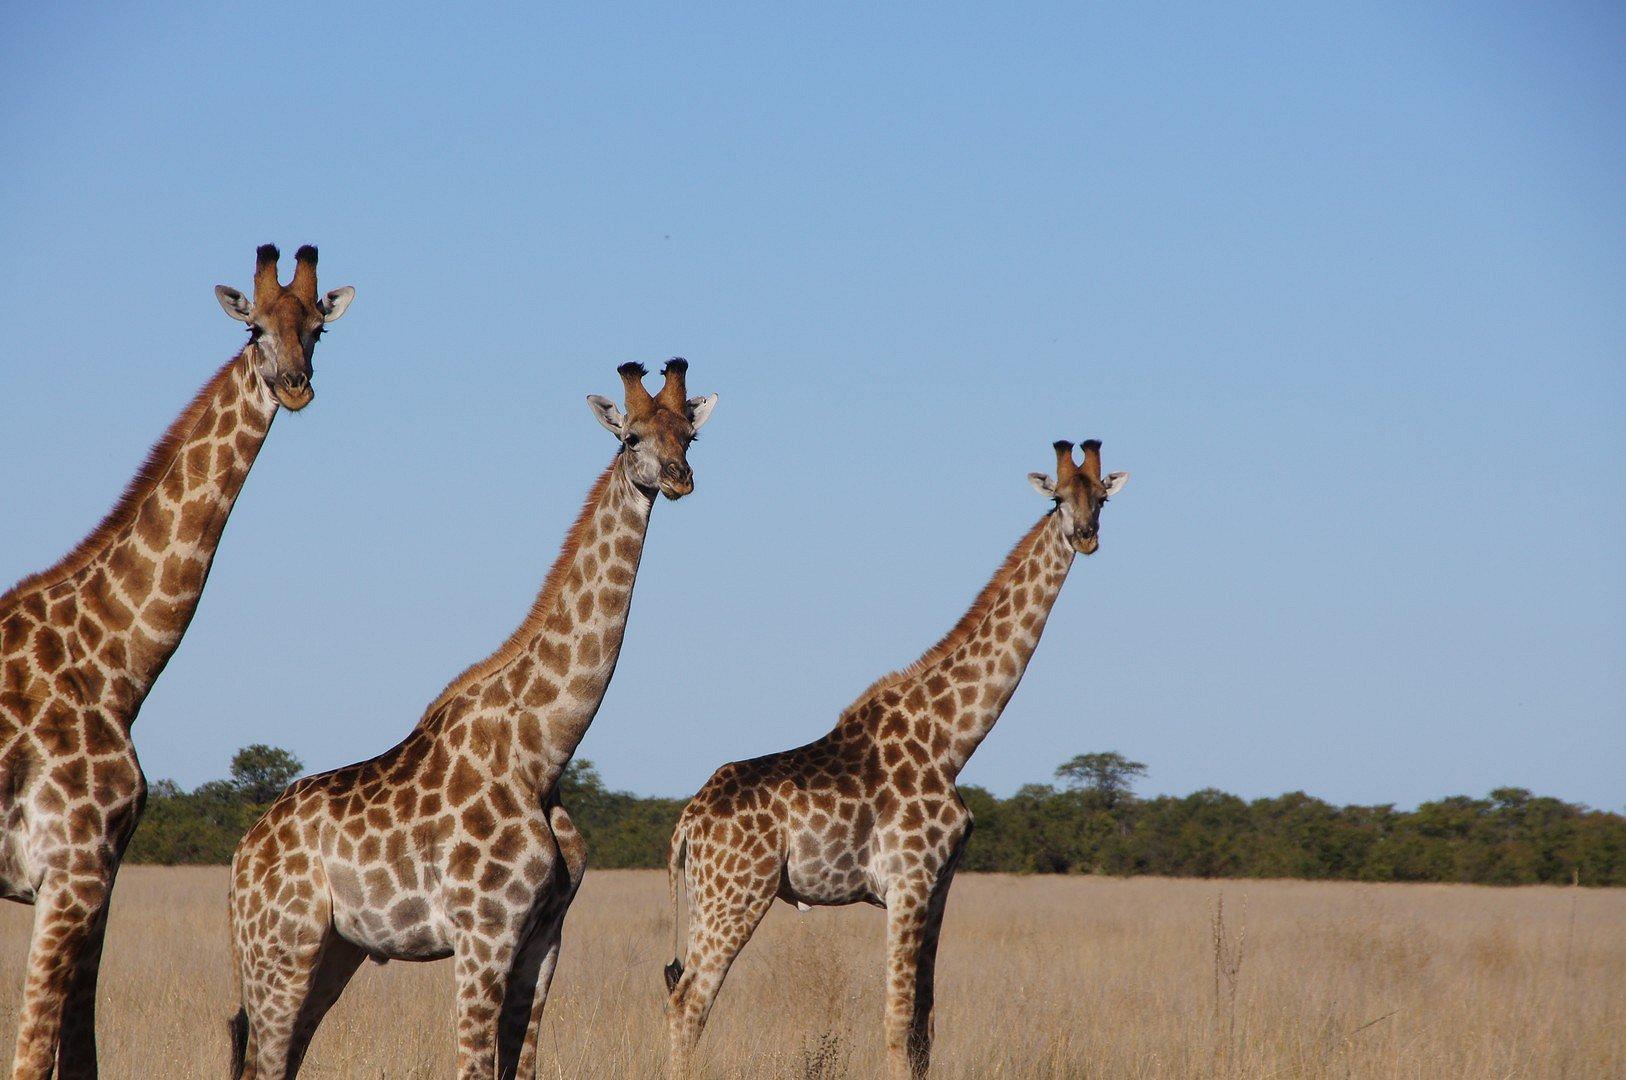 Les soeurs girafes